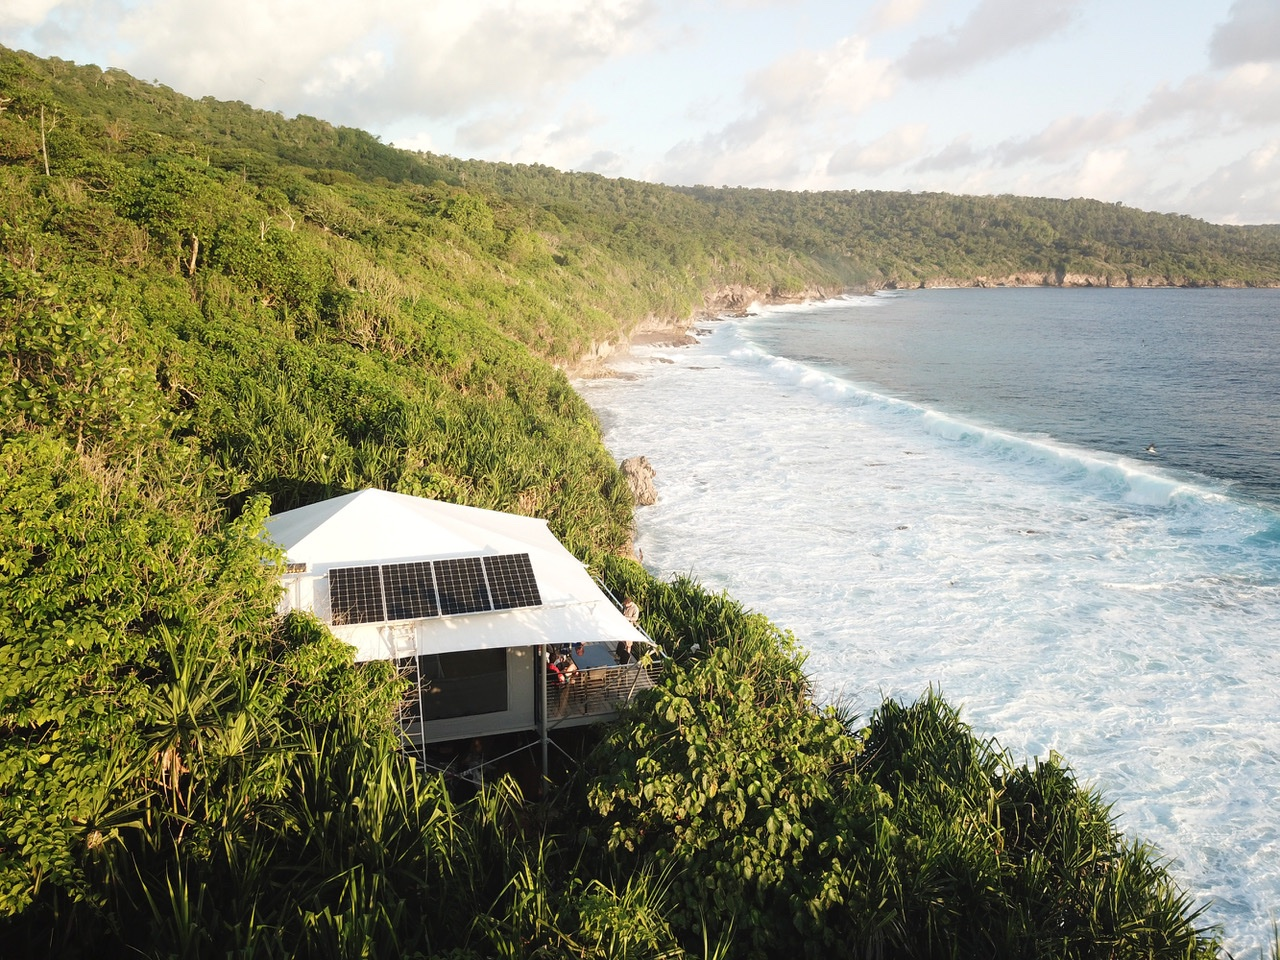 SwellLodge-Offgrid-Solar-Power-System-Christmas-Island-2.jpg